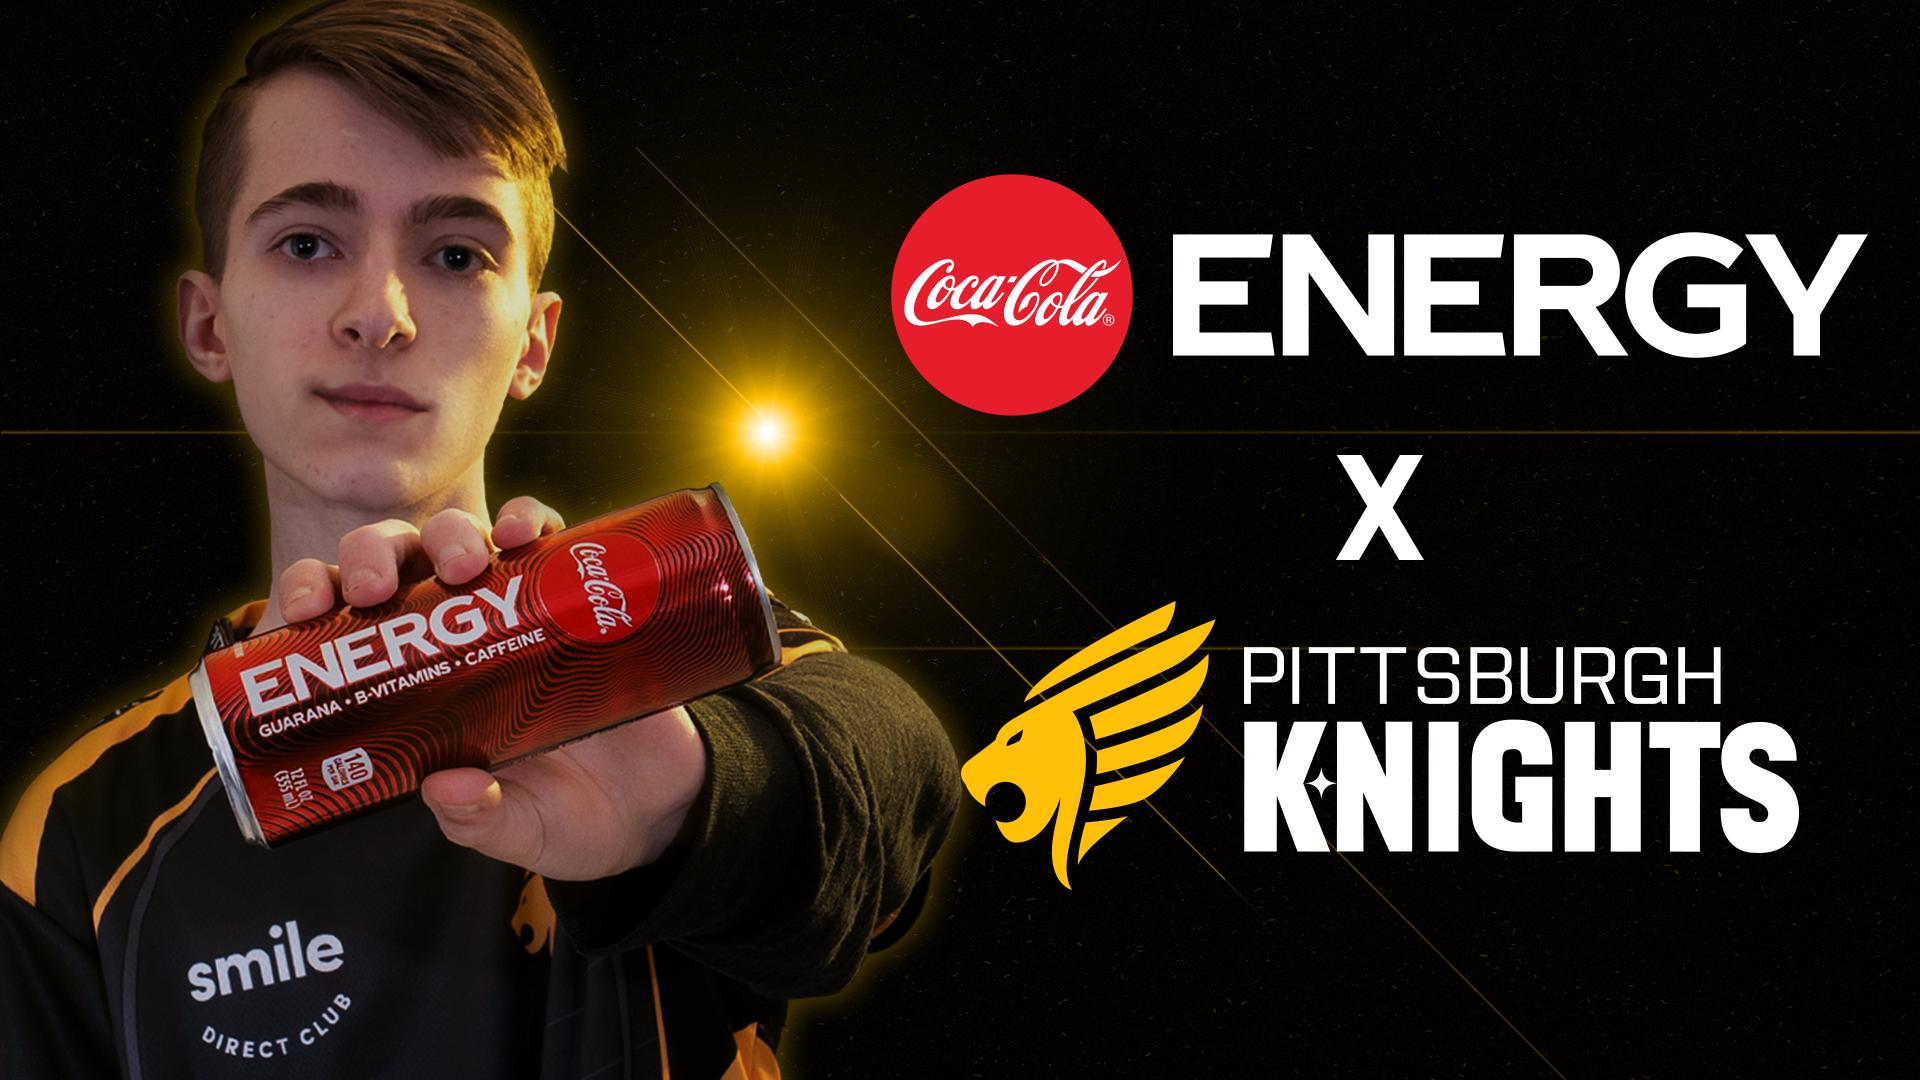 Pittsburgh Knights Coca-Cola